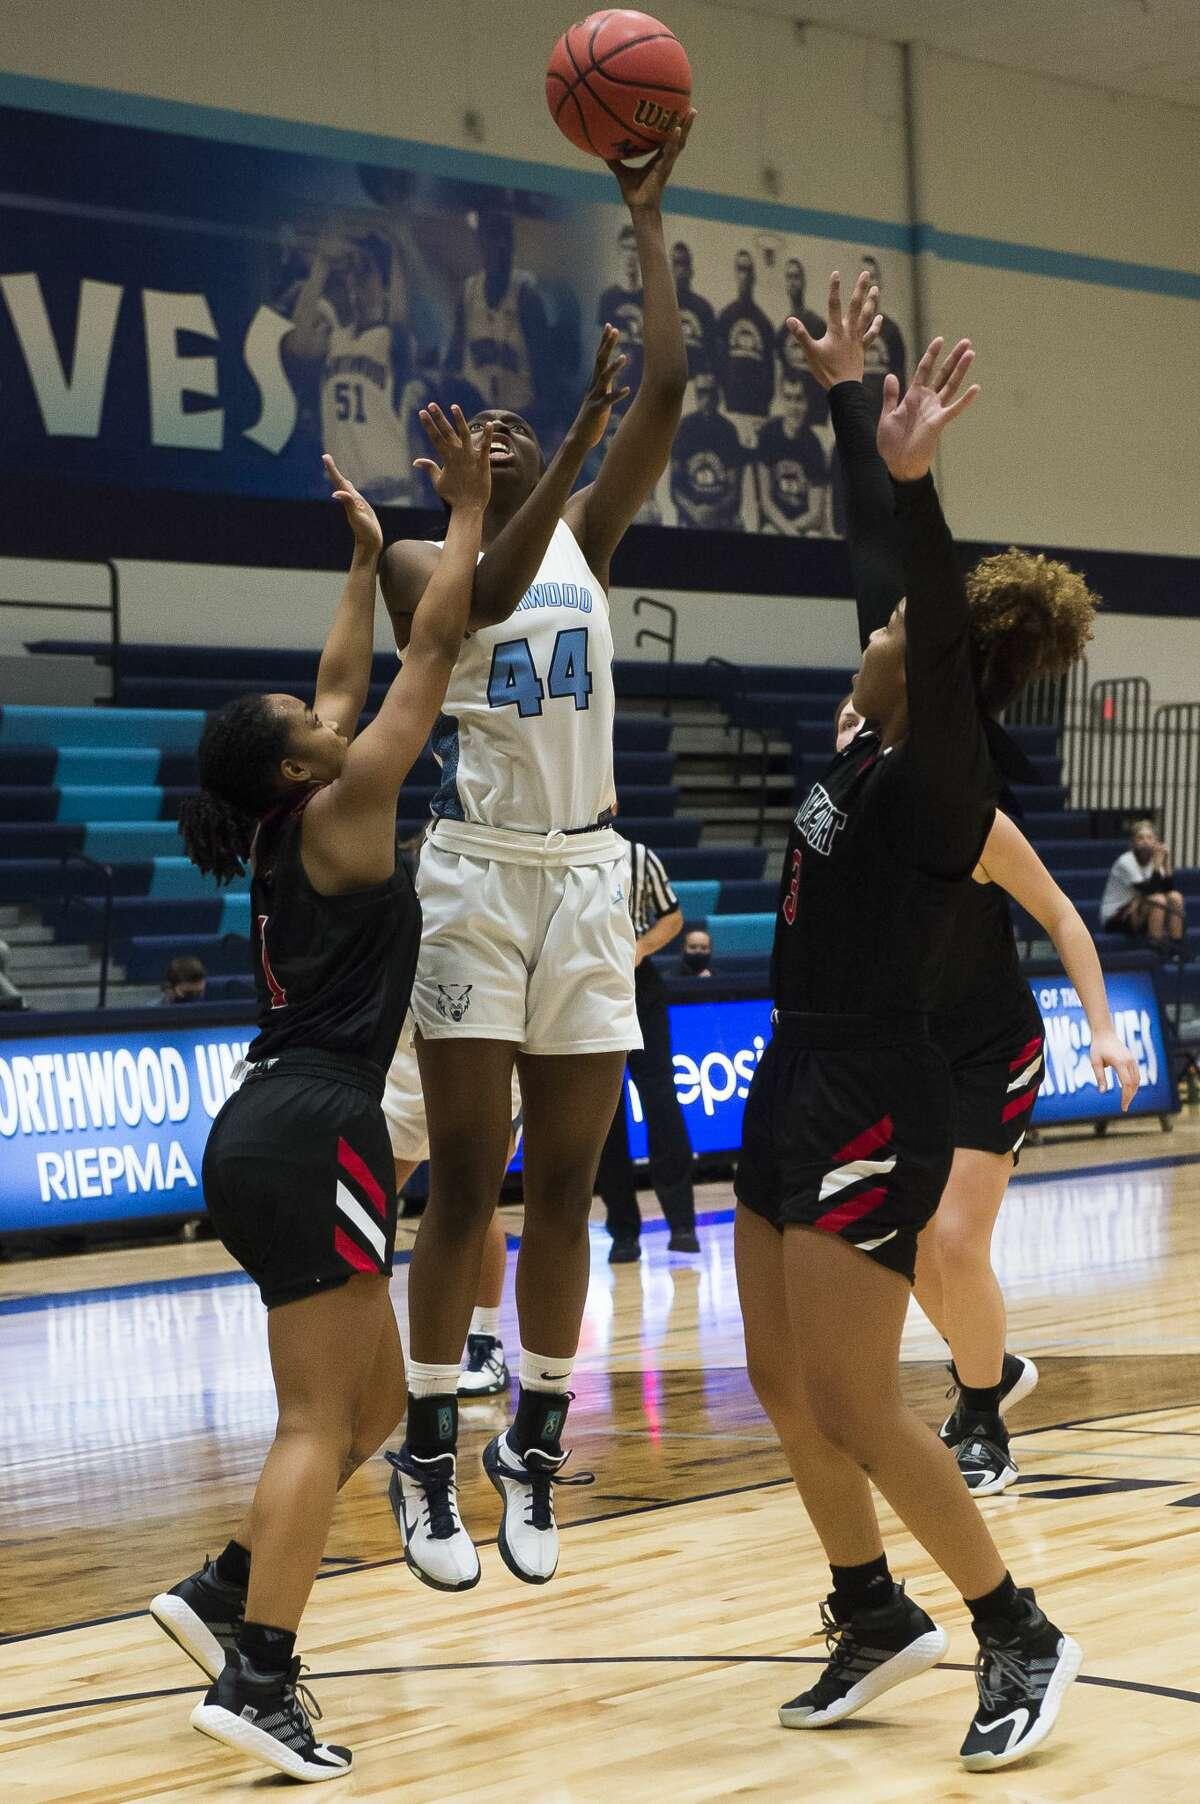 Northwood's Jayla Strickland takes a shot during a game against Davenport Friday, Jan. 8, 2021 at Northwood University. (Katy Kildee/kkildee@mdn.net)